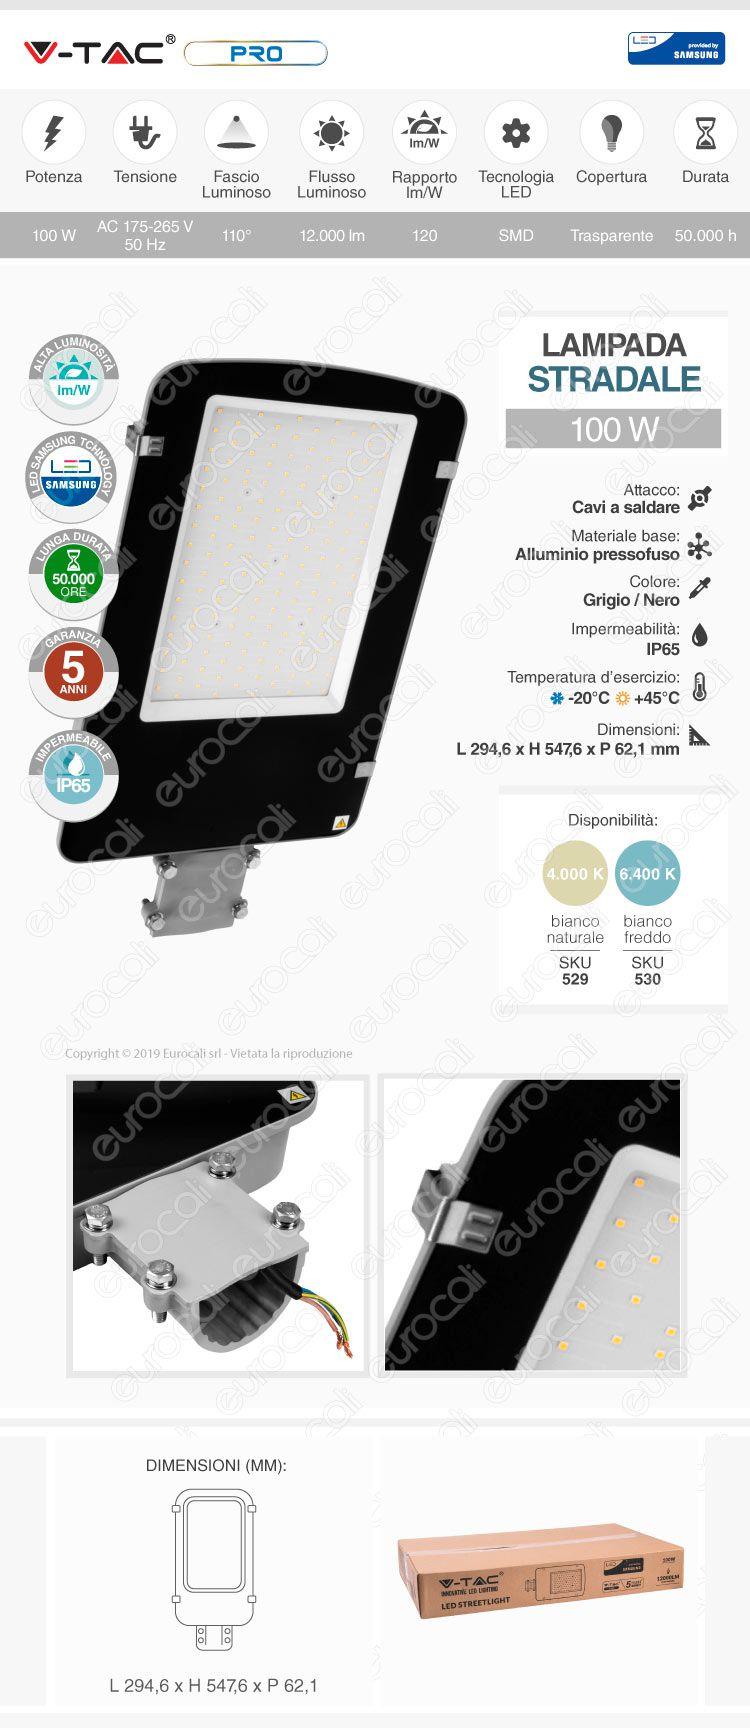 V-Tac PRO VT-100ST Lampada Stradale LED 100W Lampione SMD Chip Samsung